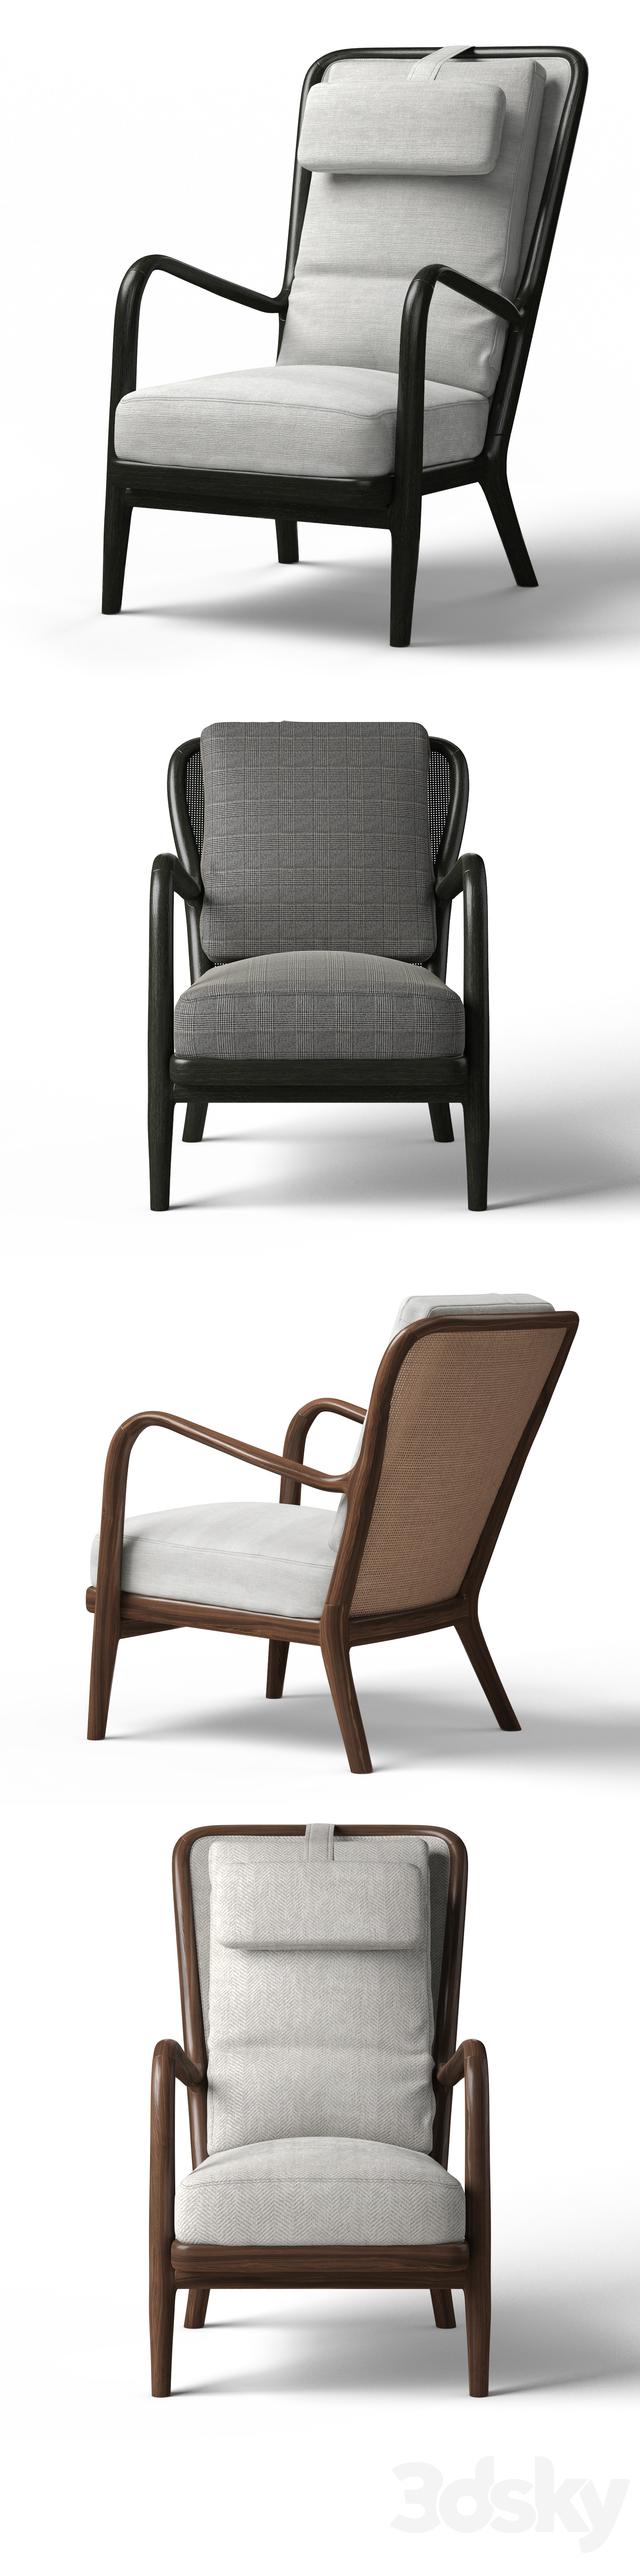 3d Models Arm Chair Flexform Agave Bergere Armchairs